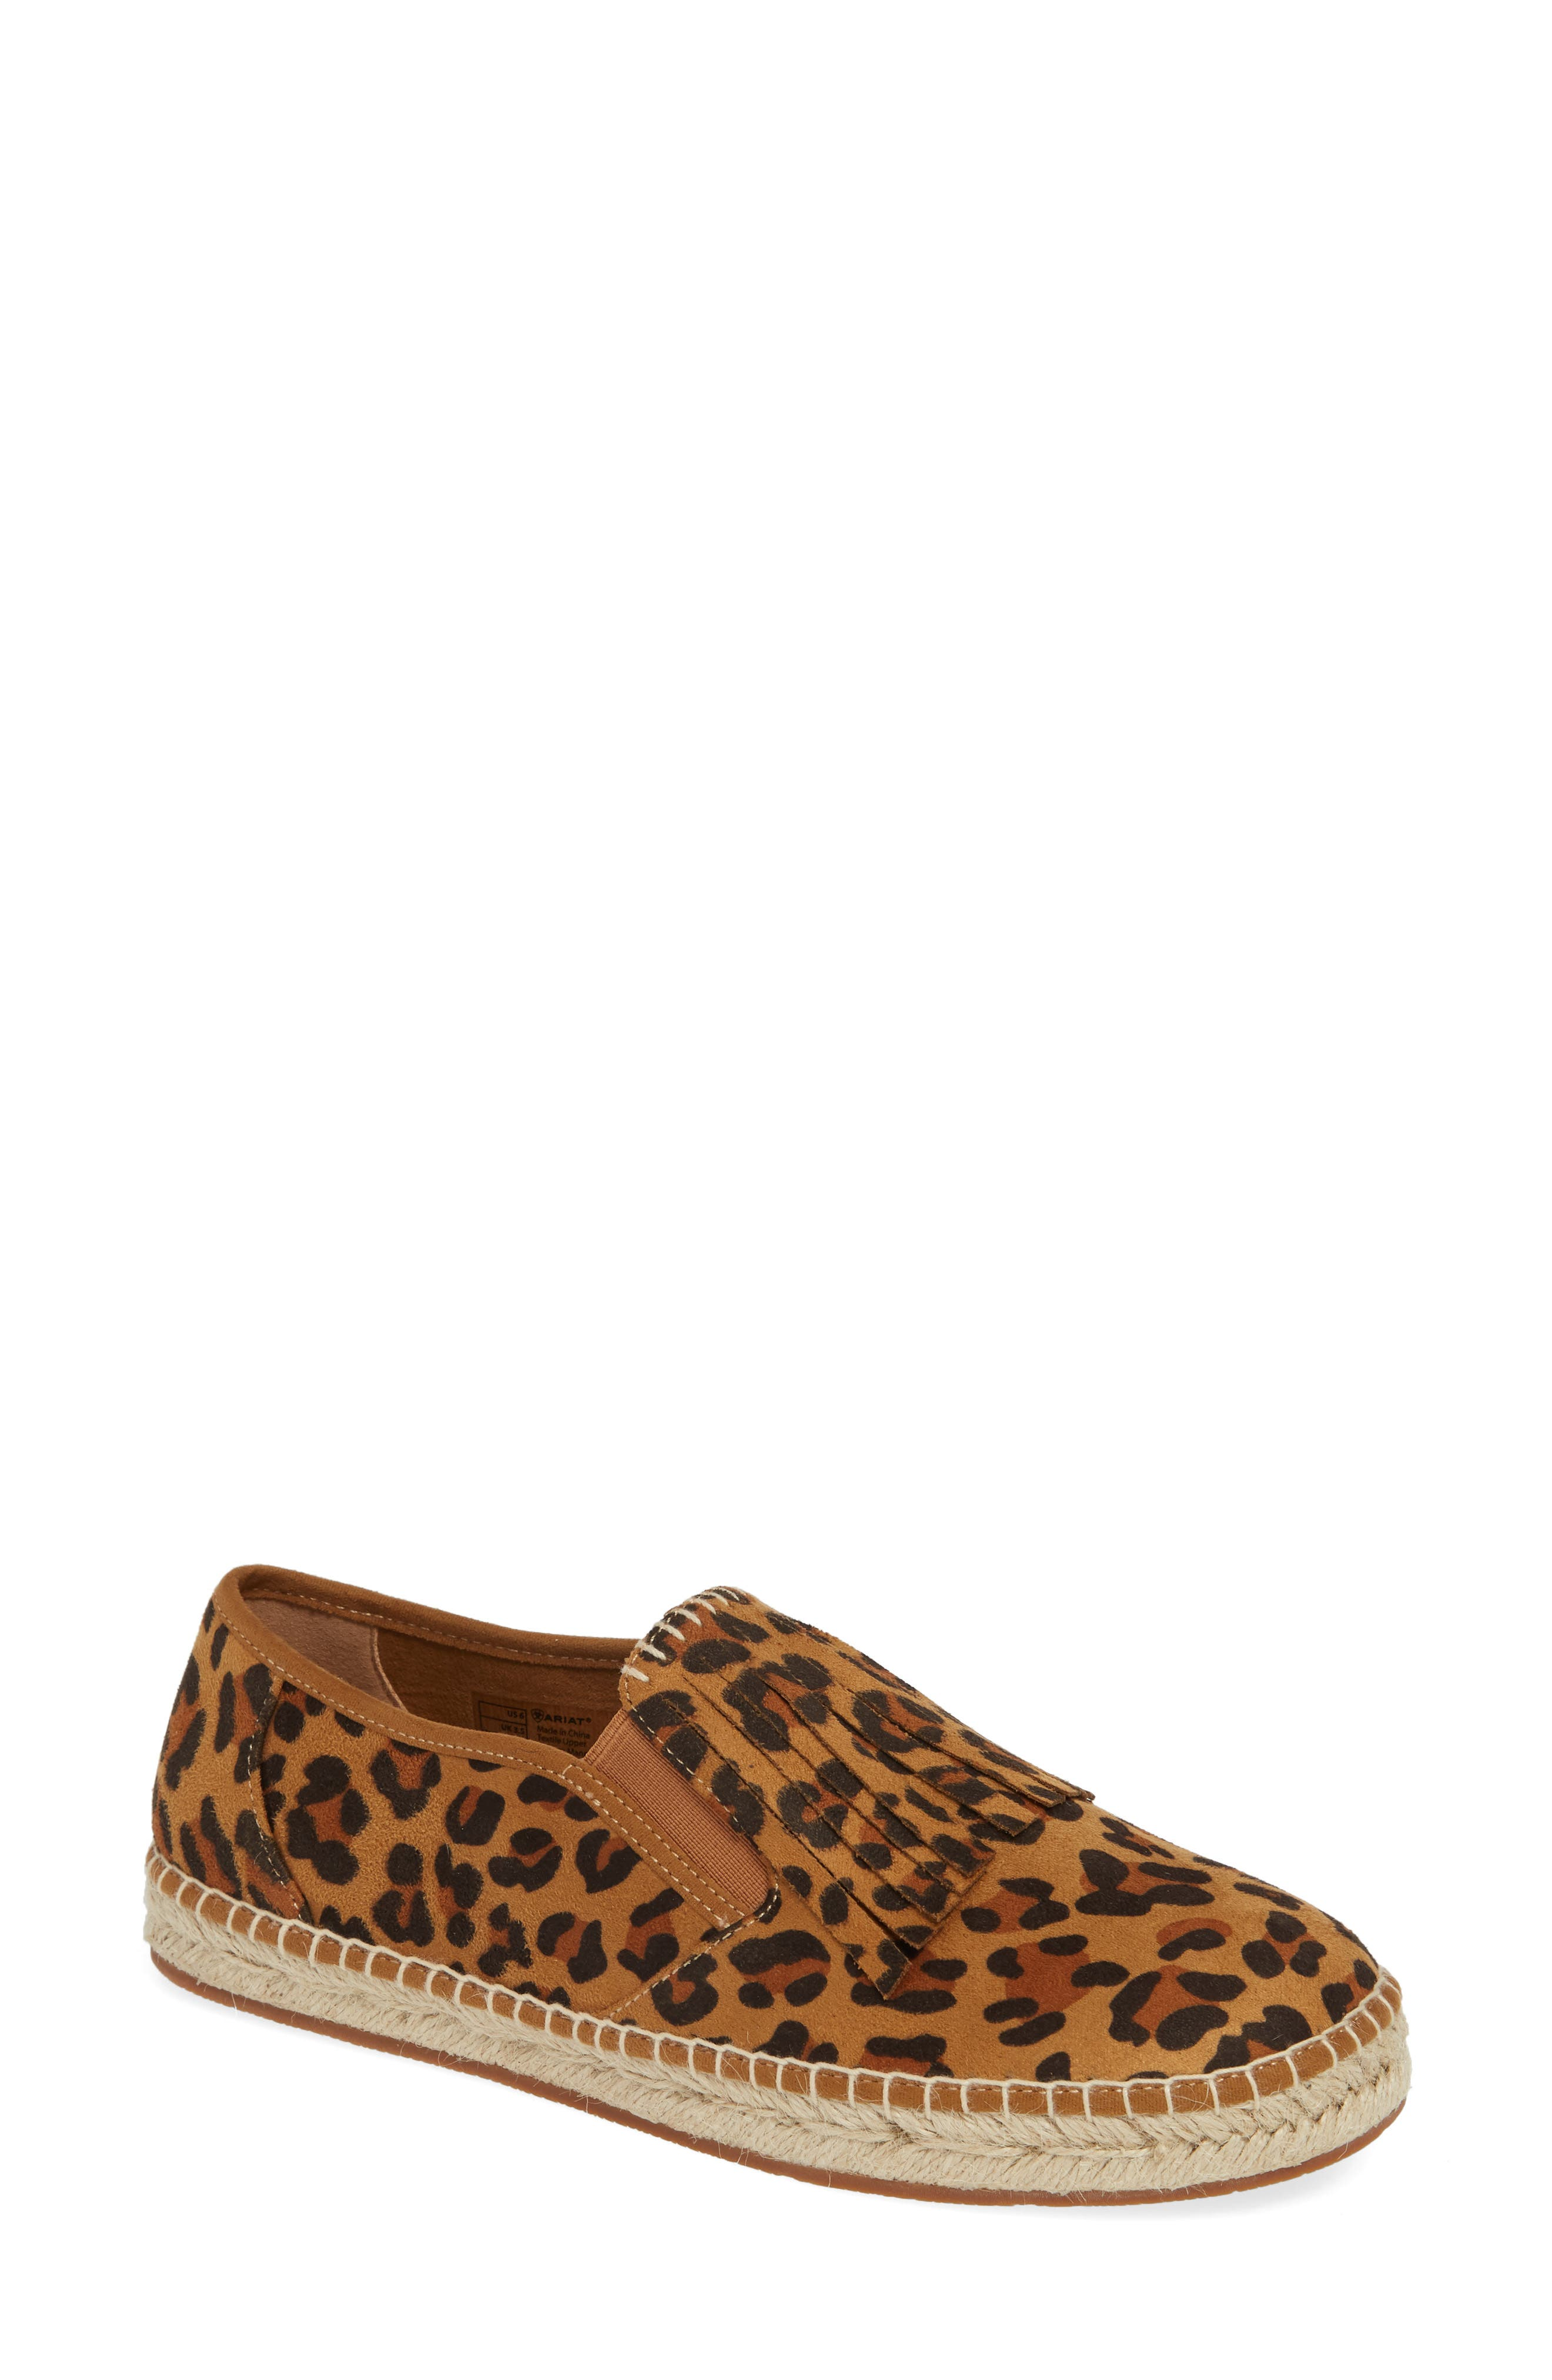 Ariat Joy Kiltie Slip-On Sneaker, Brown